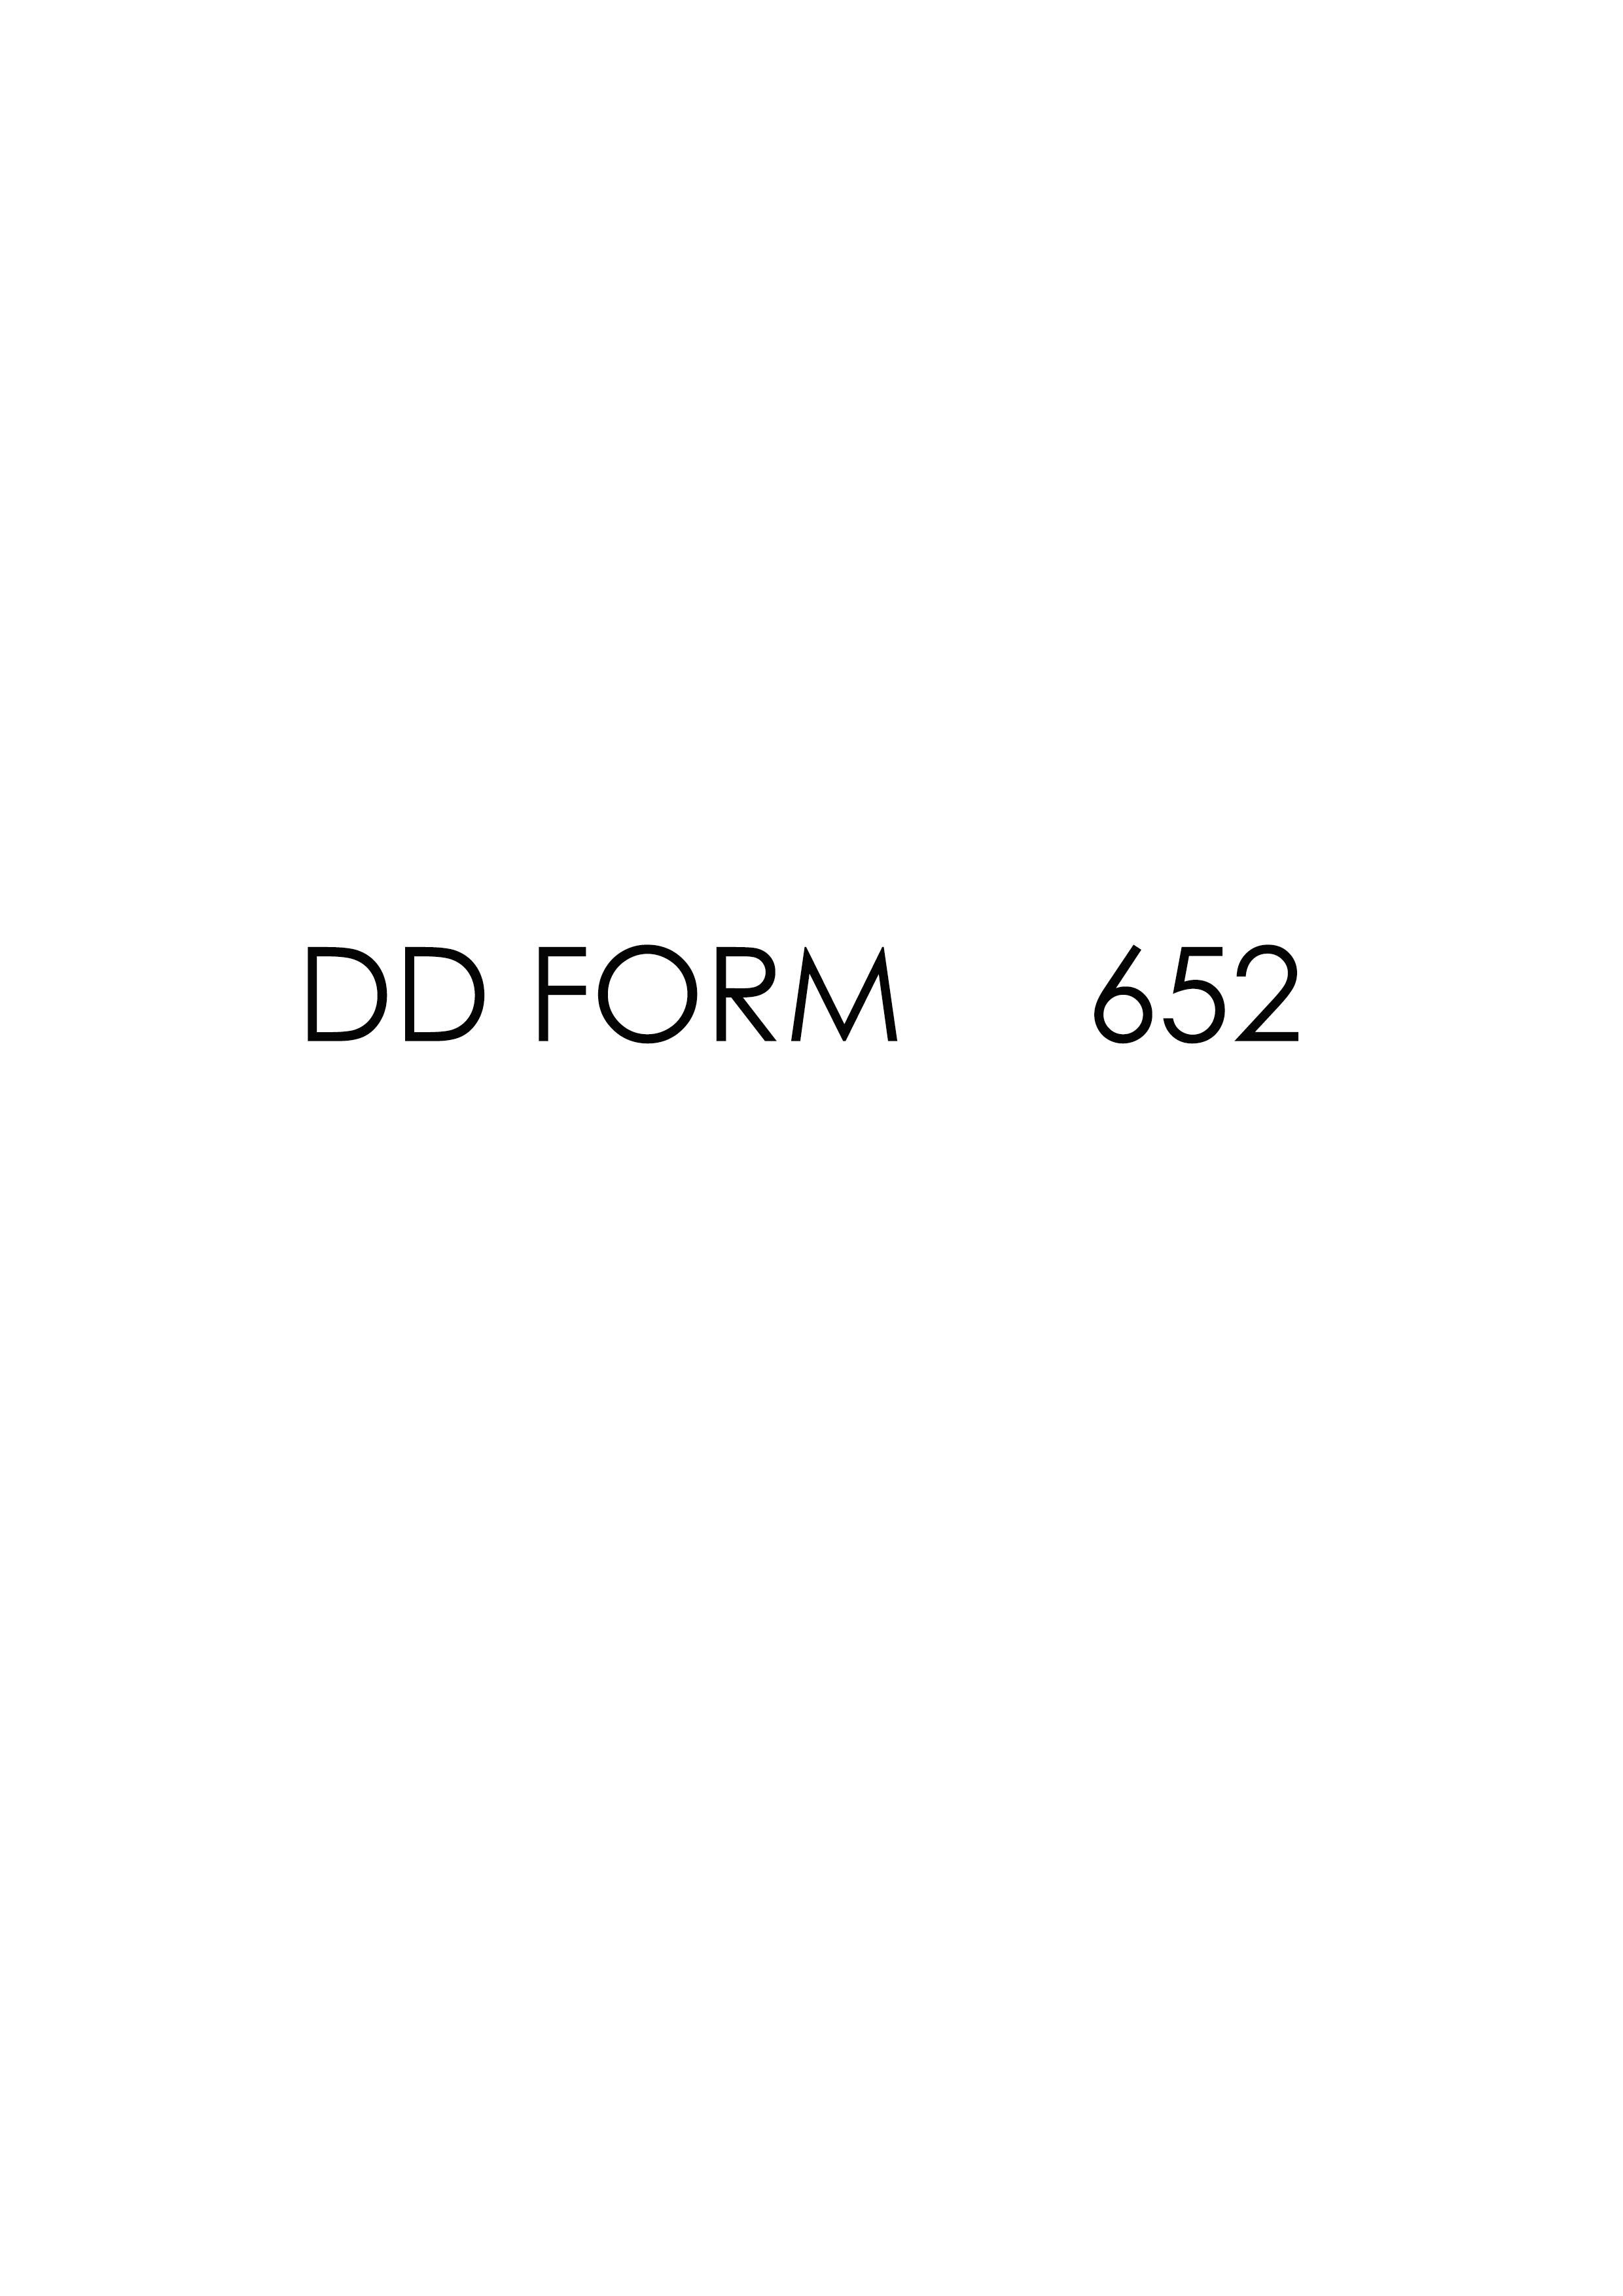 Download dd Form 652 Free